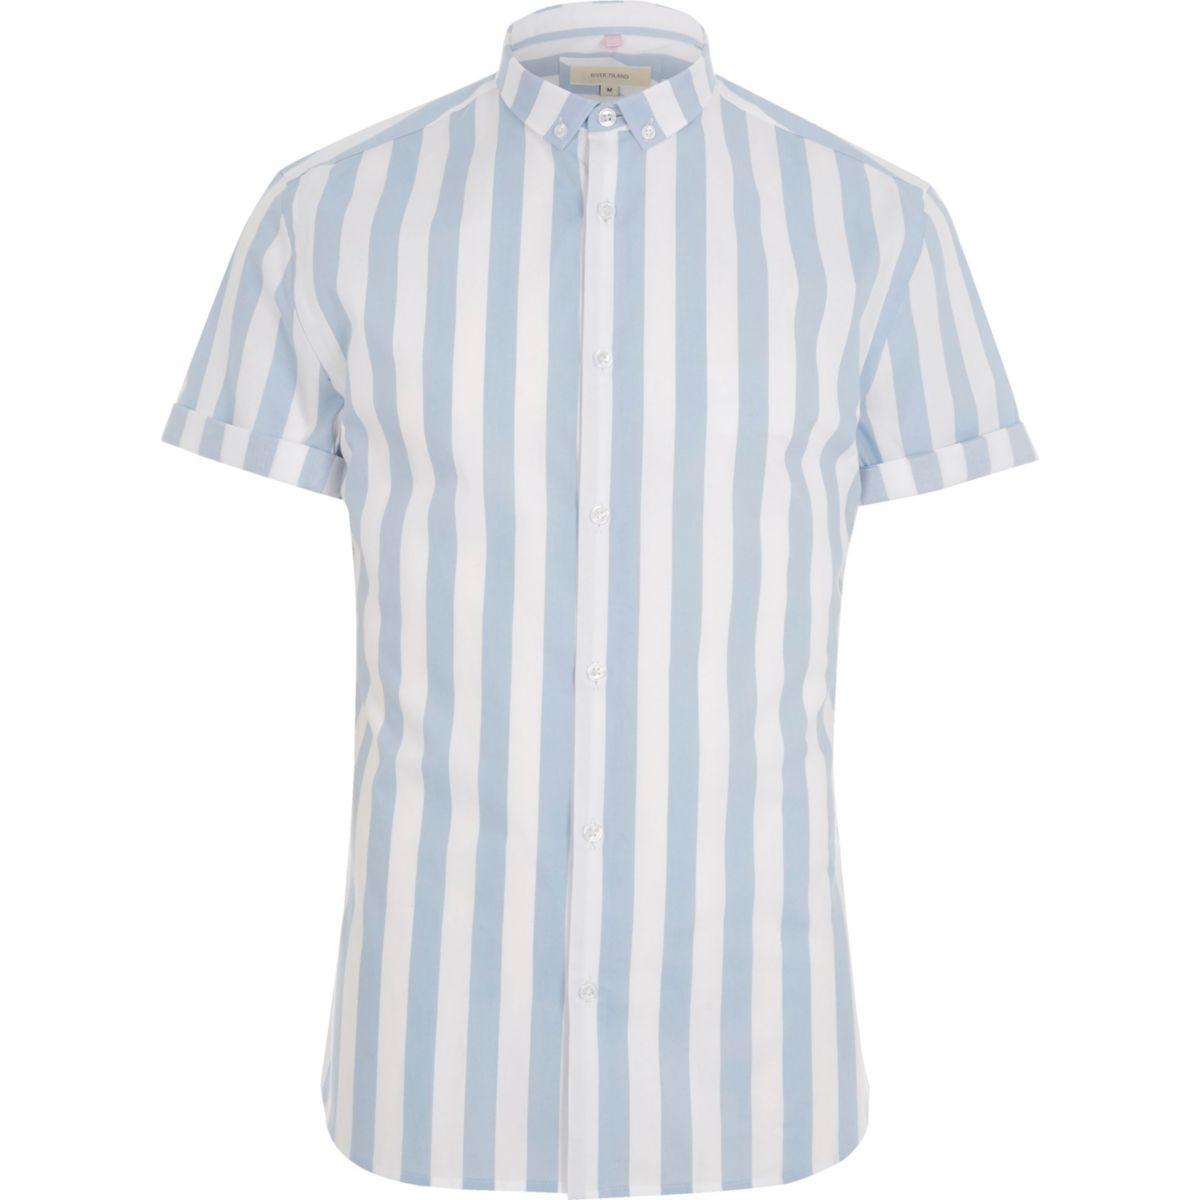 Blaues, kurzärmliges Muscle Fit Hemd